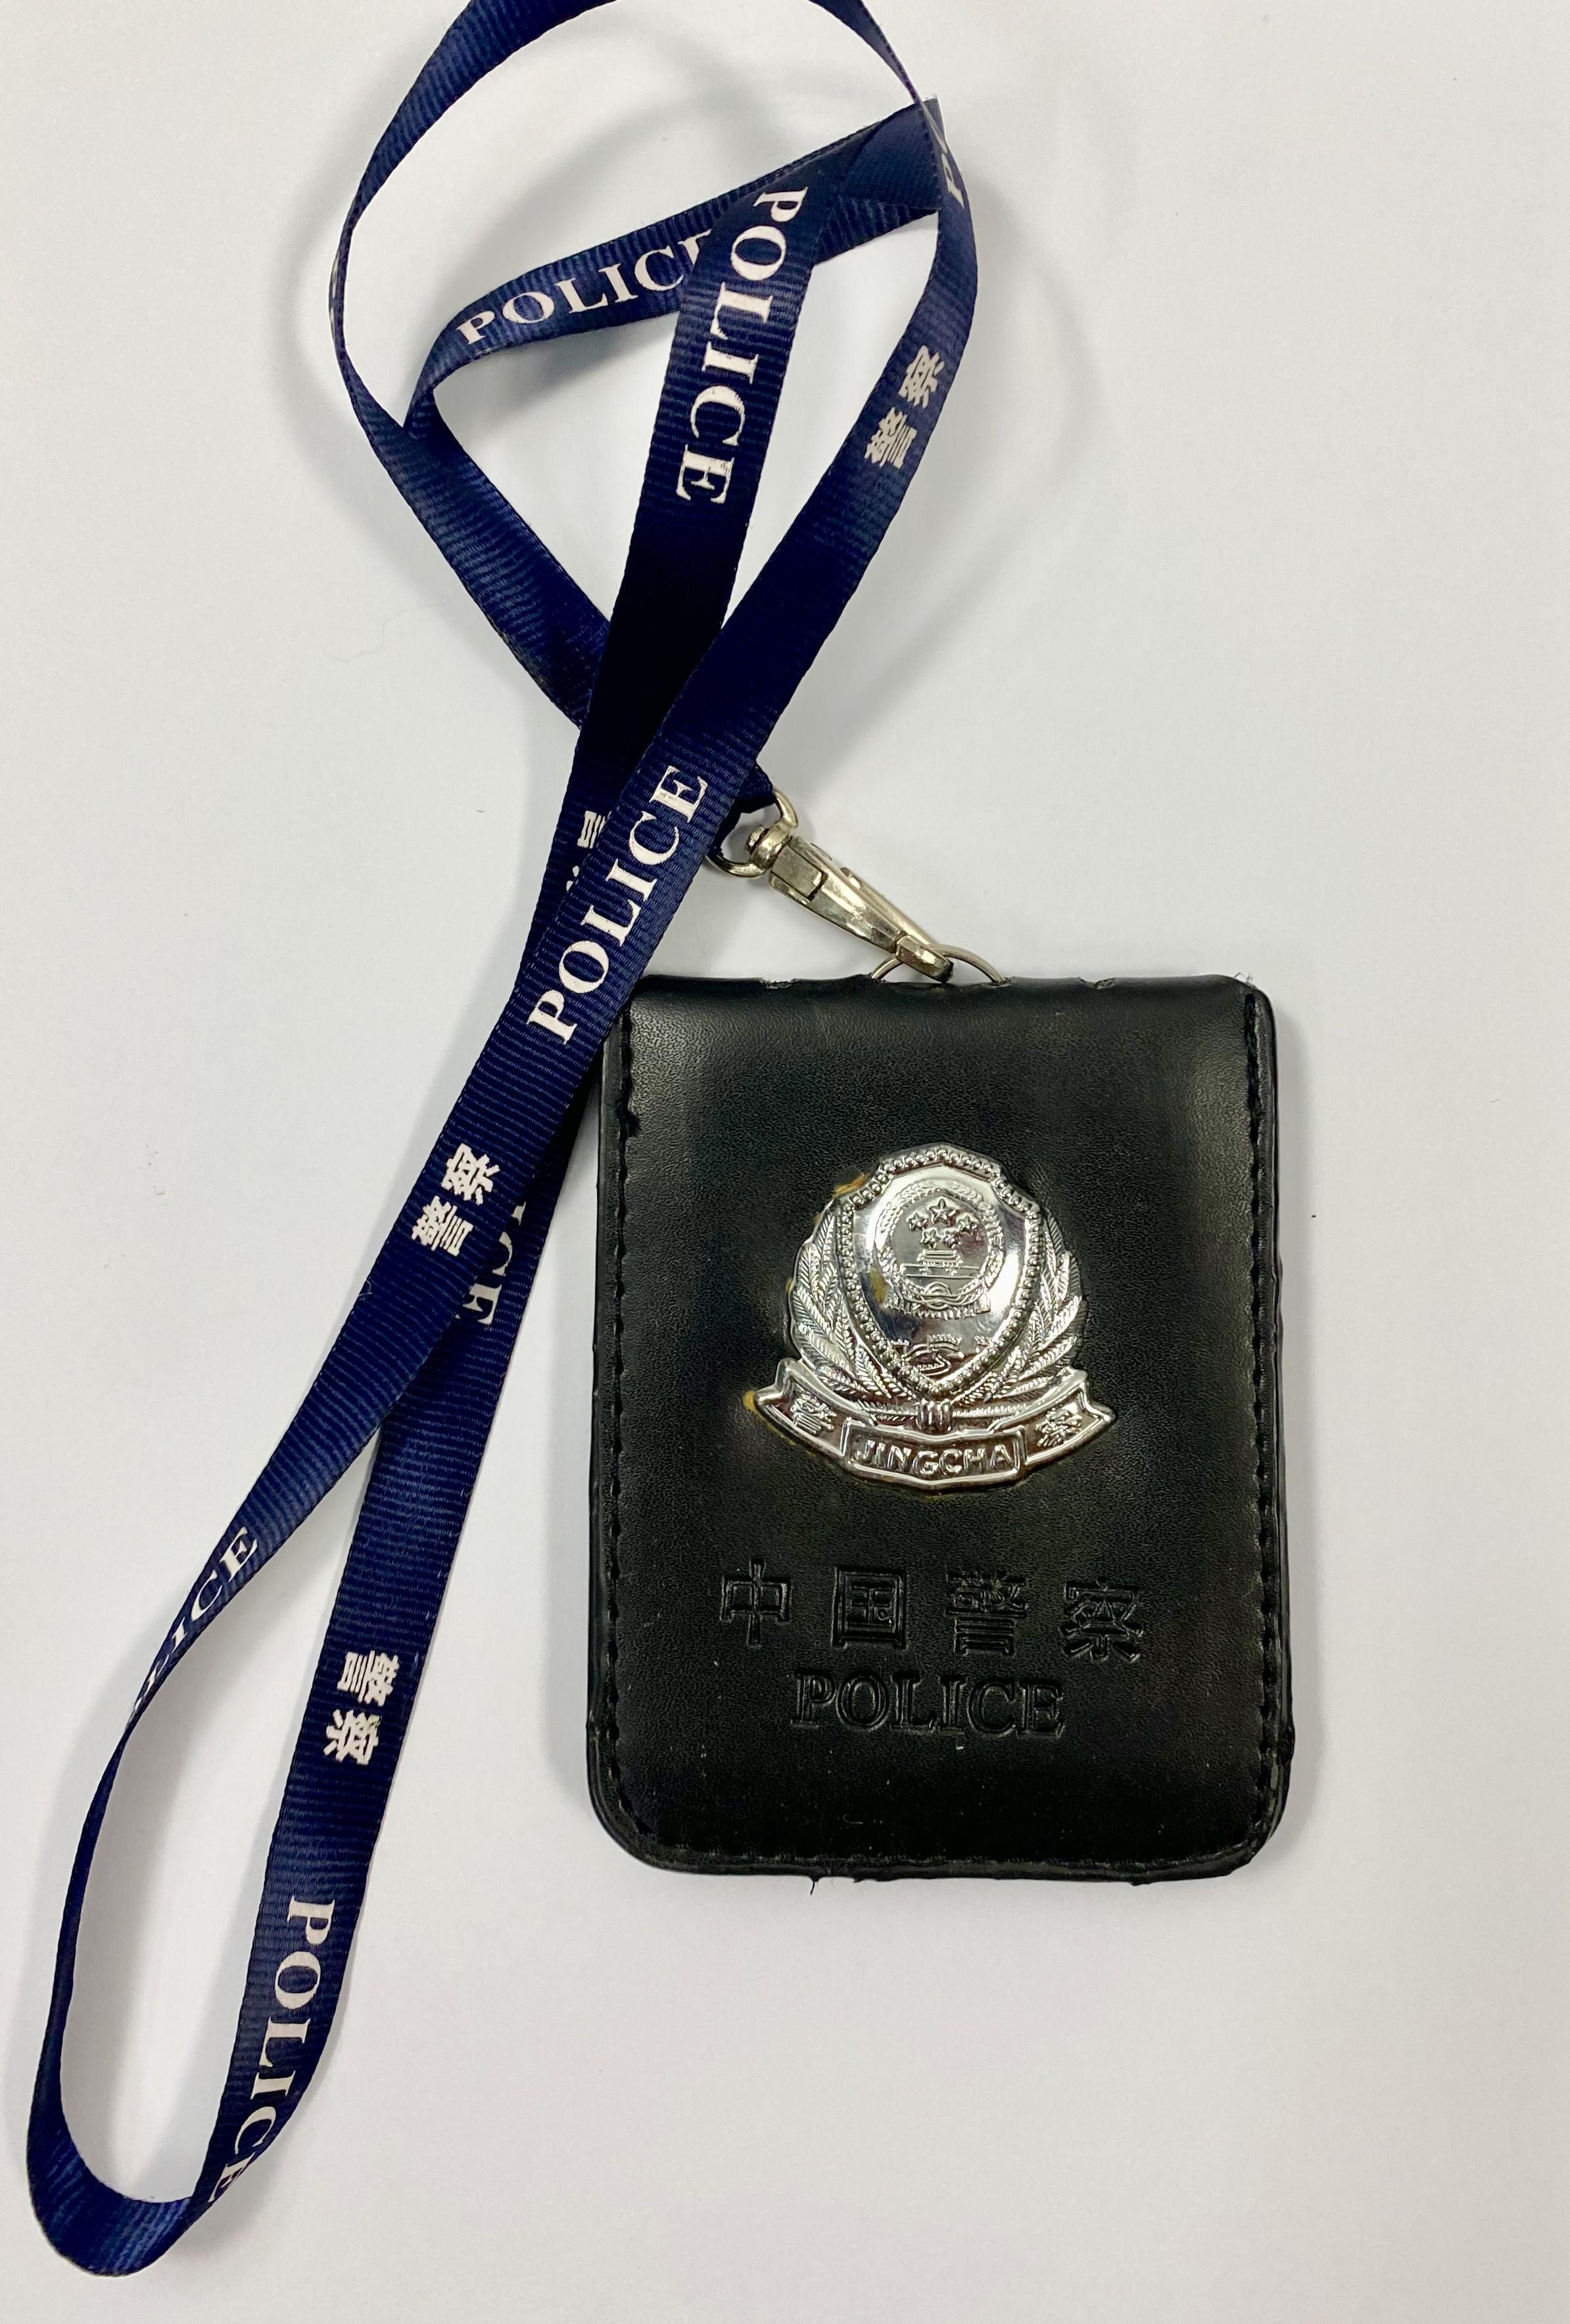 CUELLO-CHINA POLICE BADGE 警察 - jĭngchá